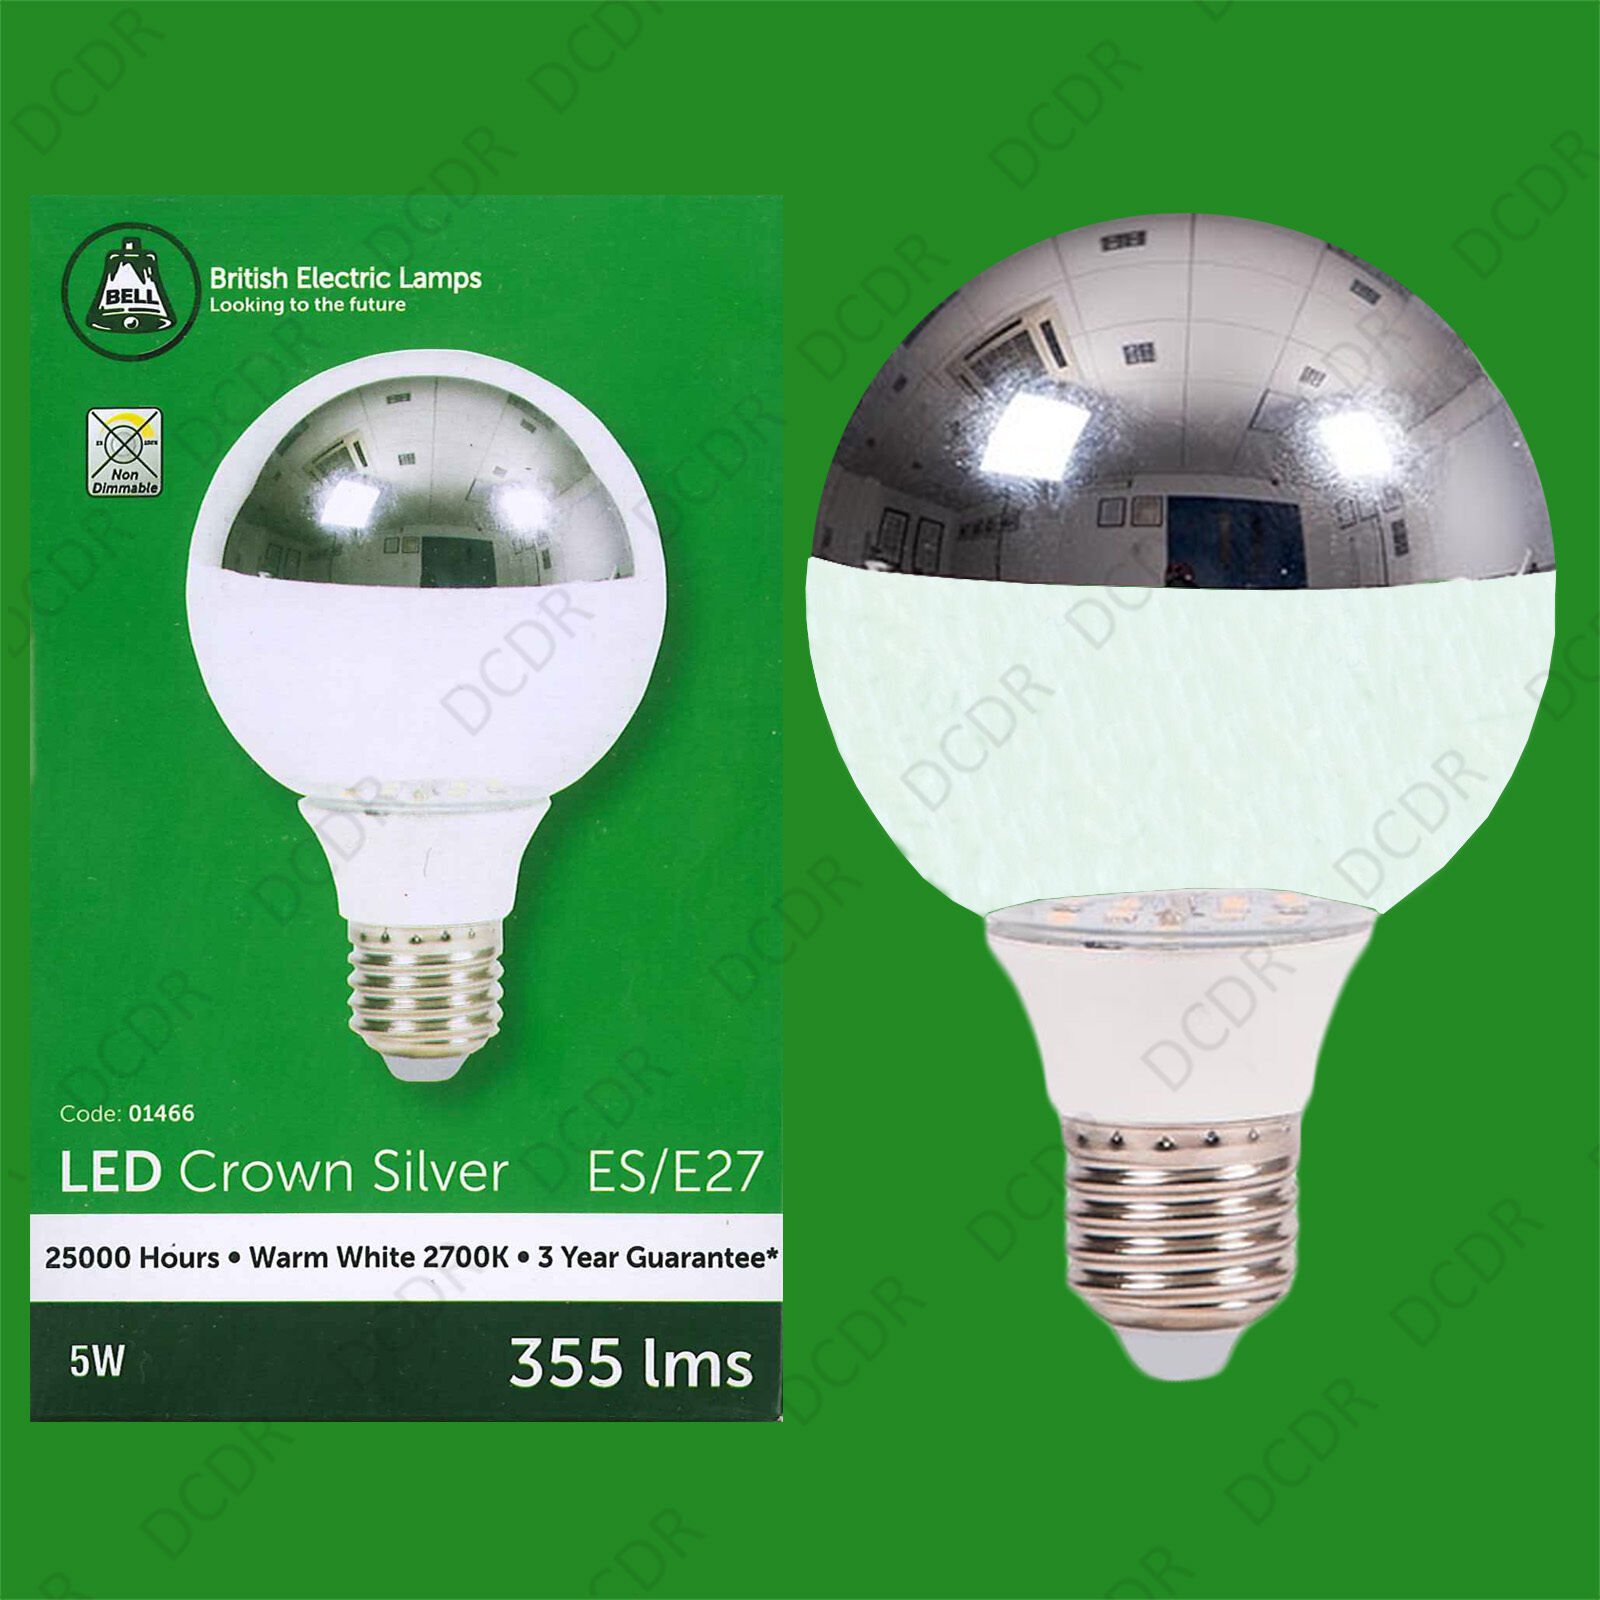 10x 5W LED en la parte superior de corona Plata Instantáneo Reflector G80 Lámpara Bombilla claro E27